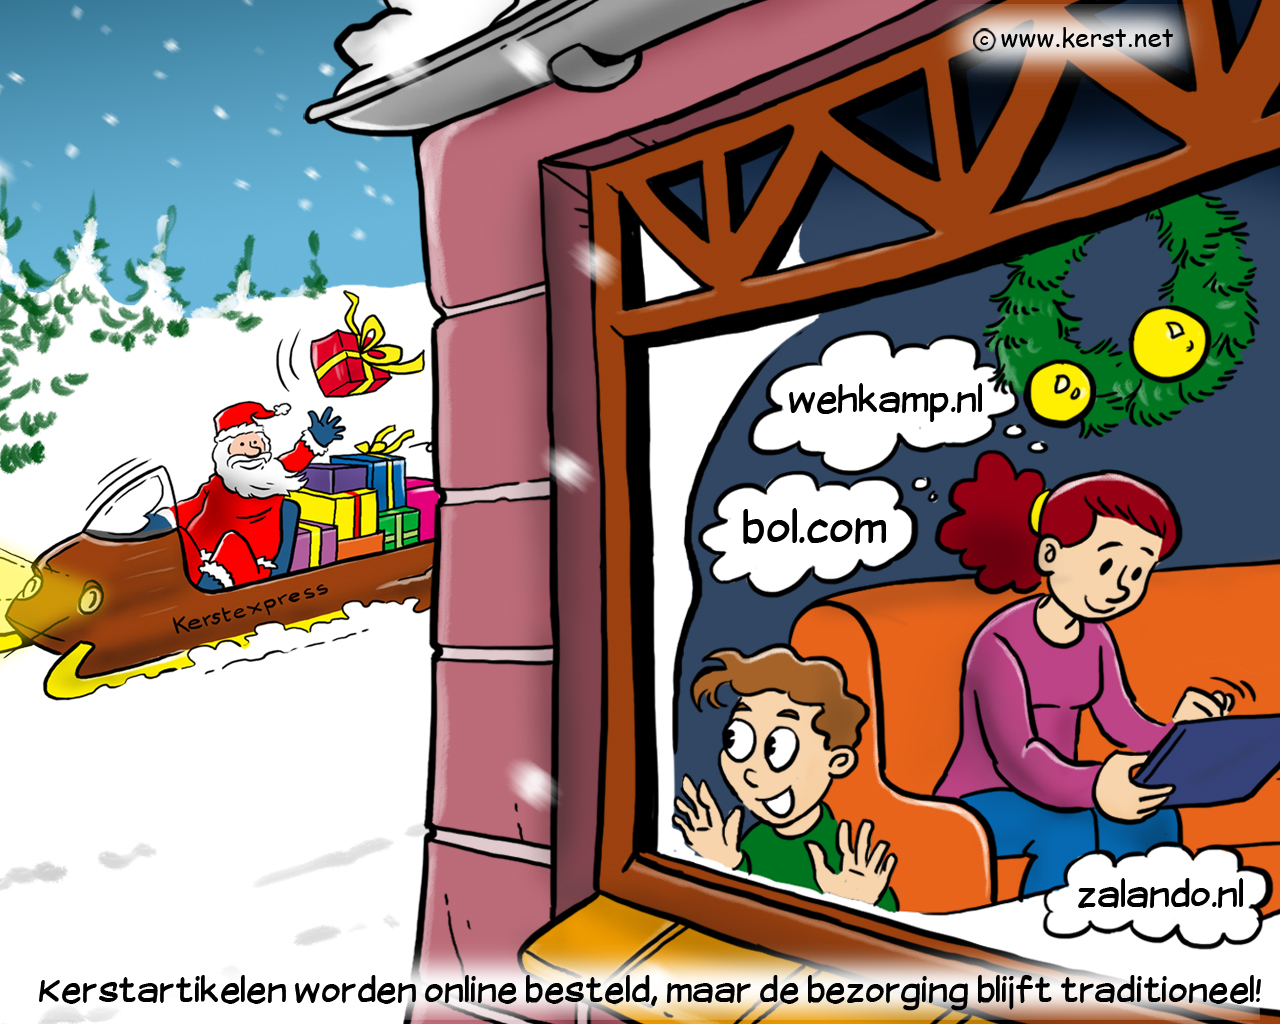 Kerst Plaatjes En Animated Gifs En Wallpaper Download Op Kerst Net